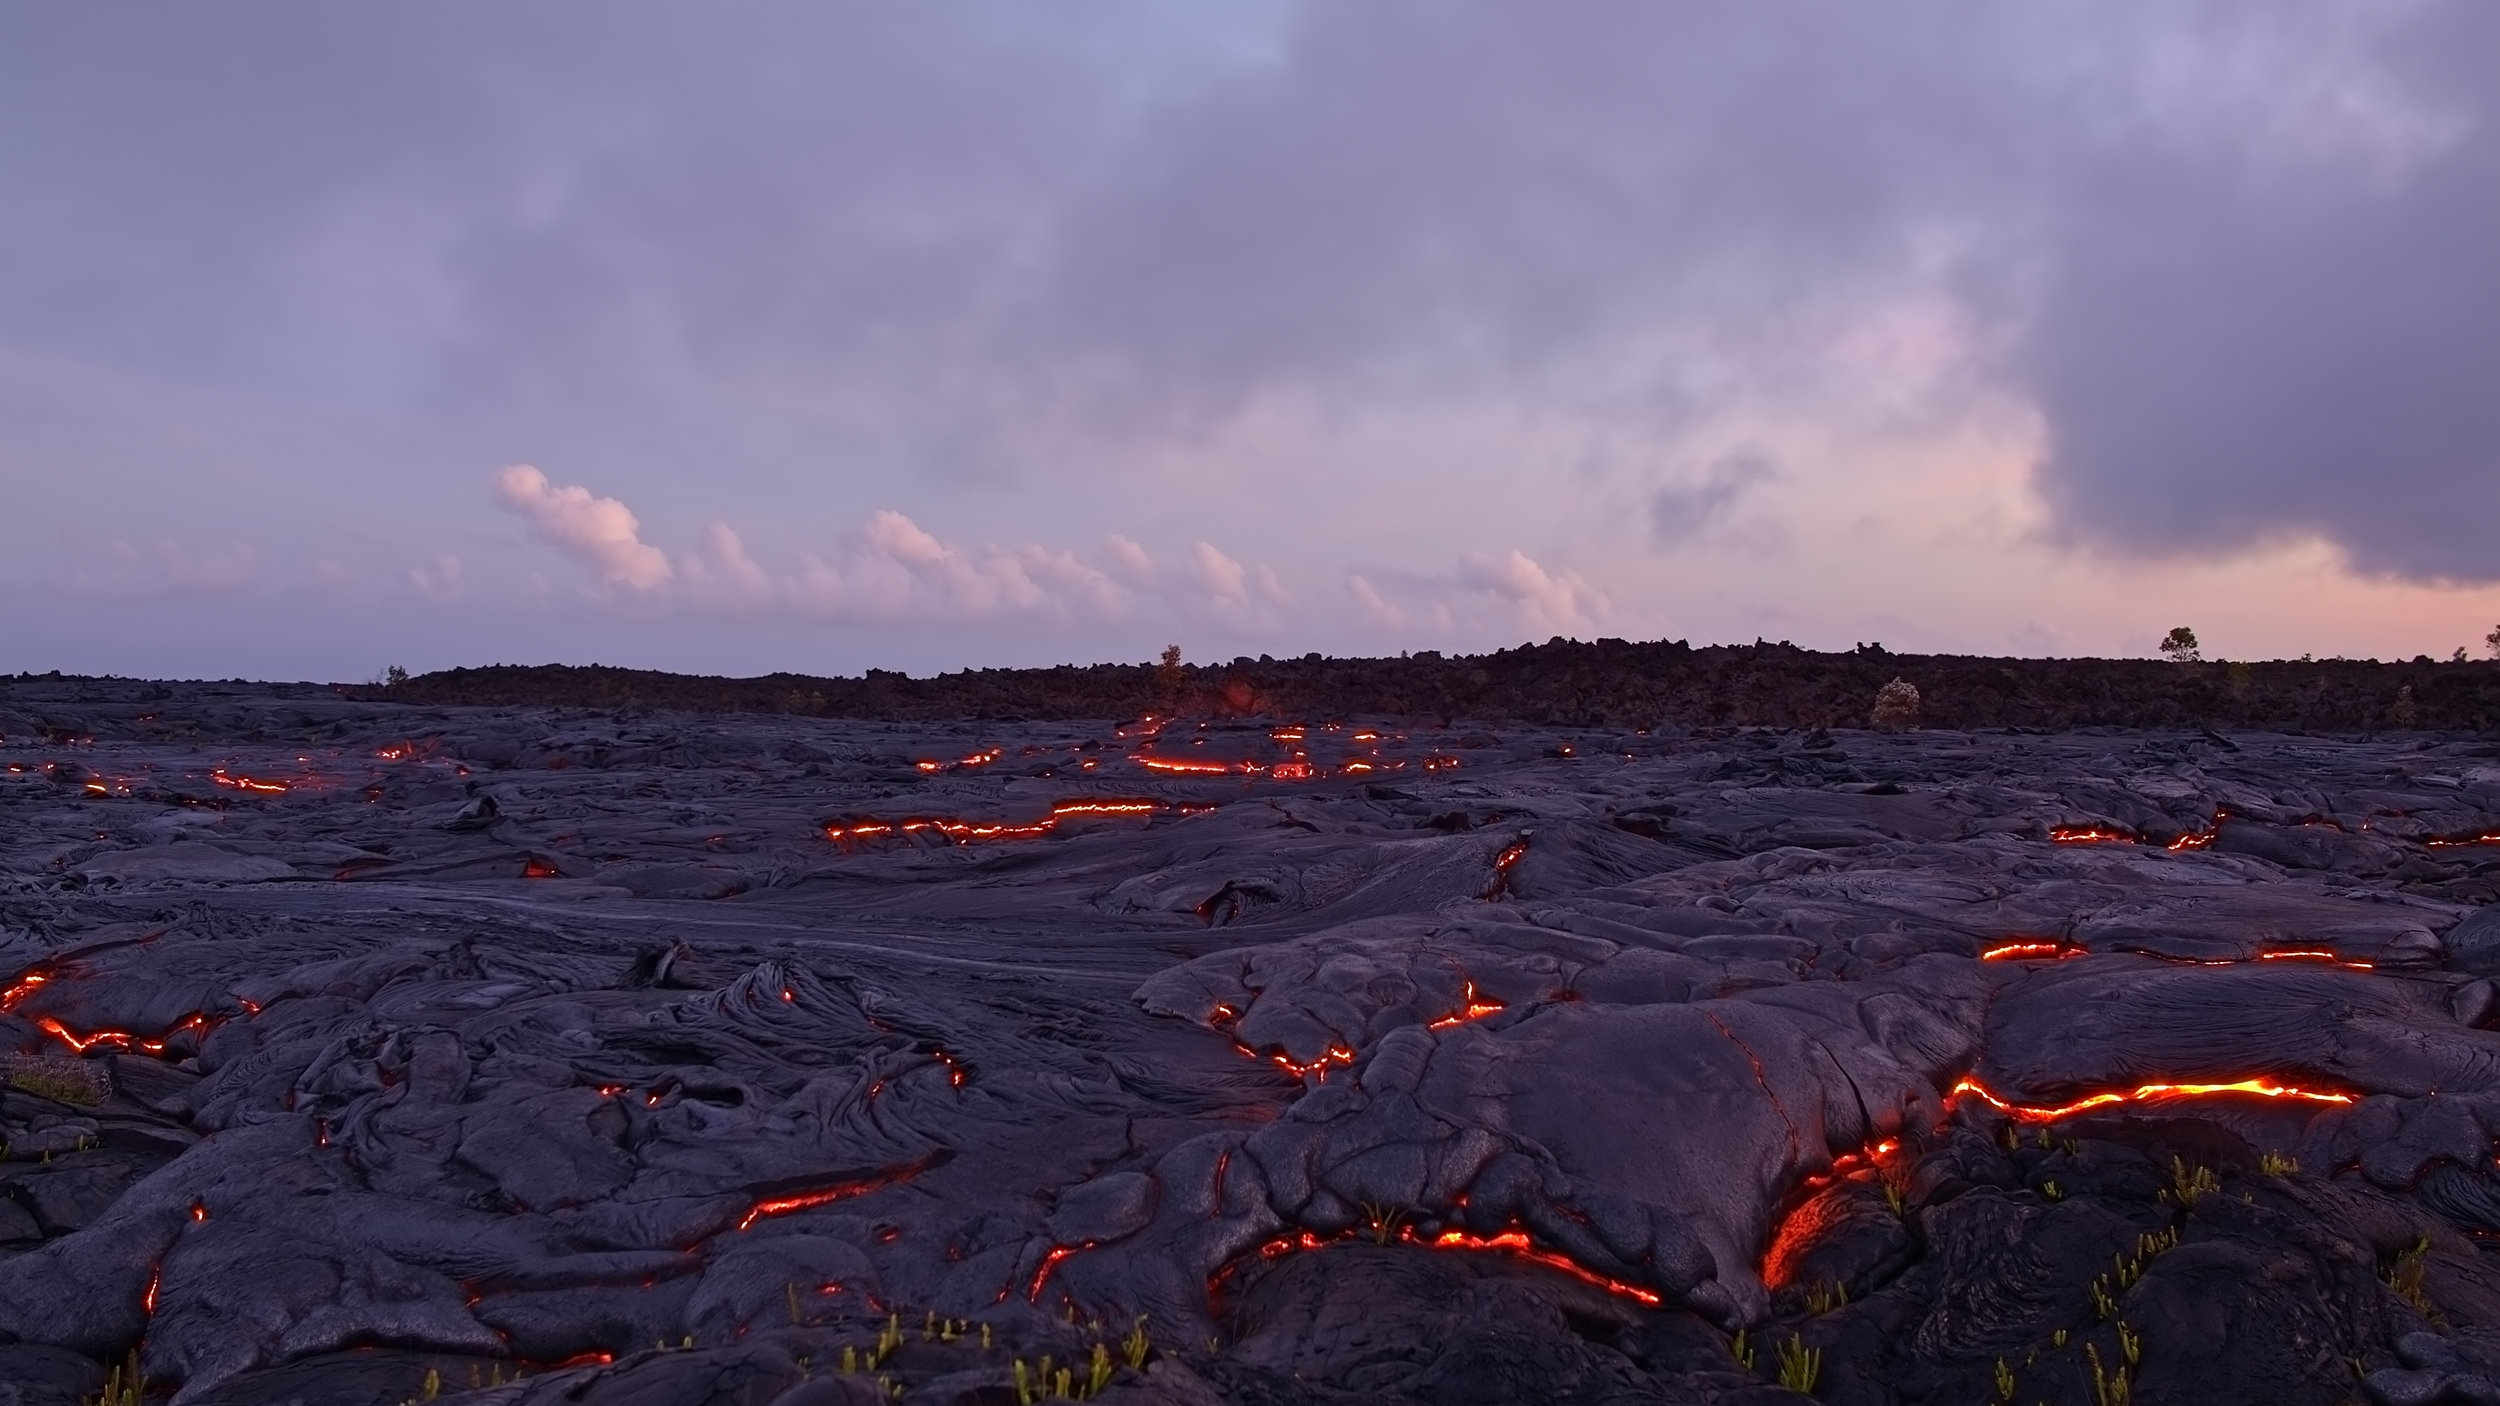 Lava on Kilauea